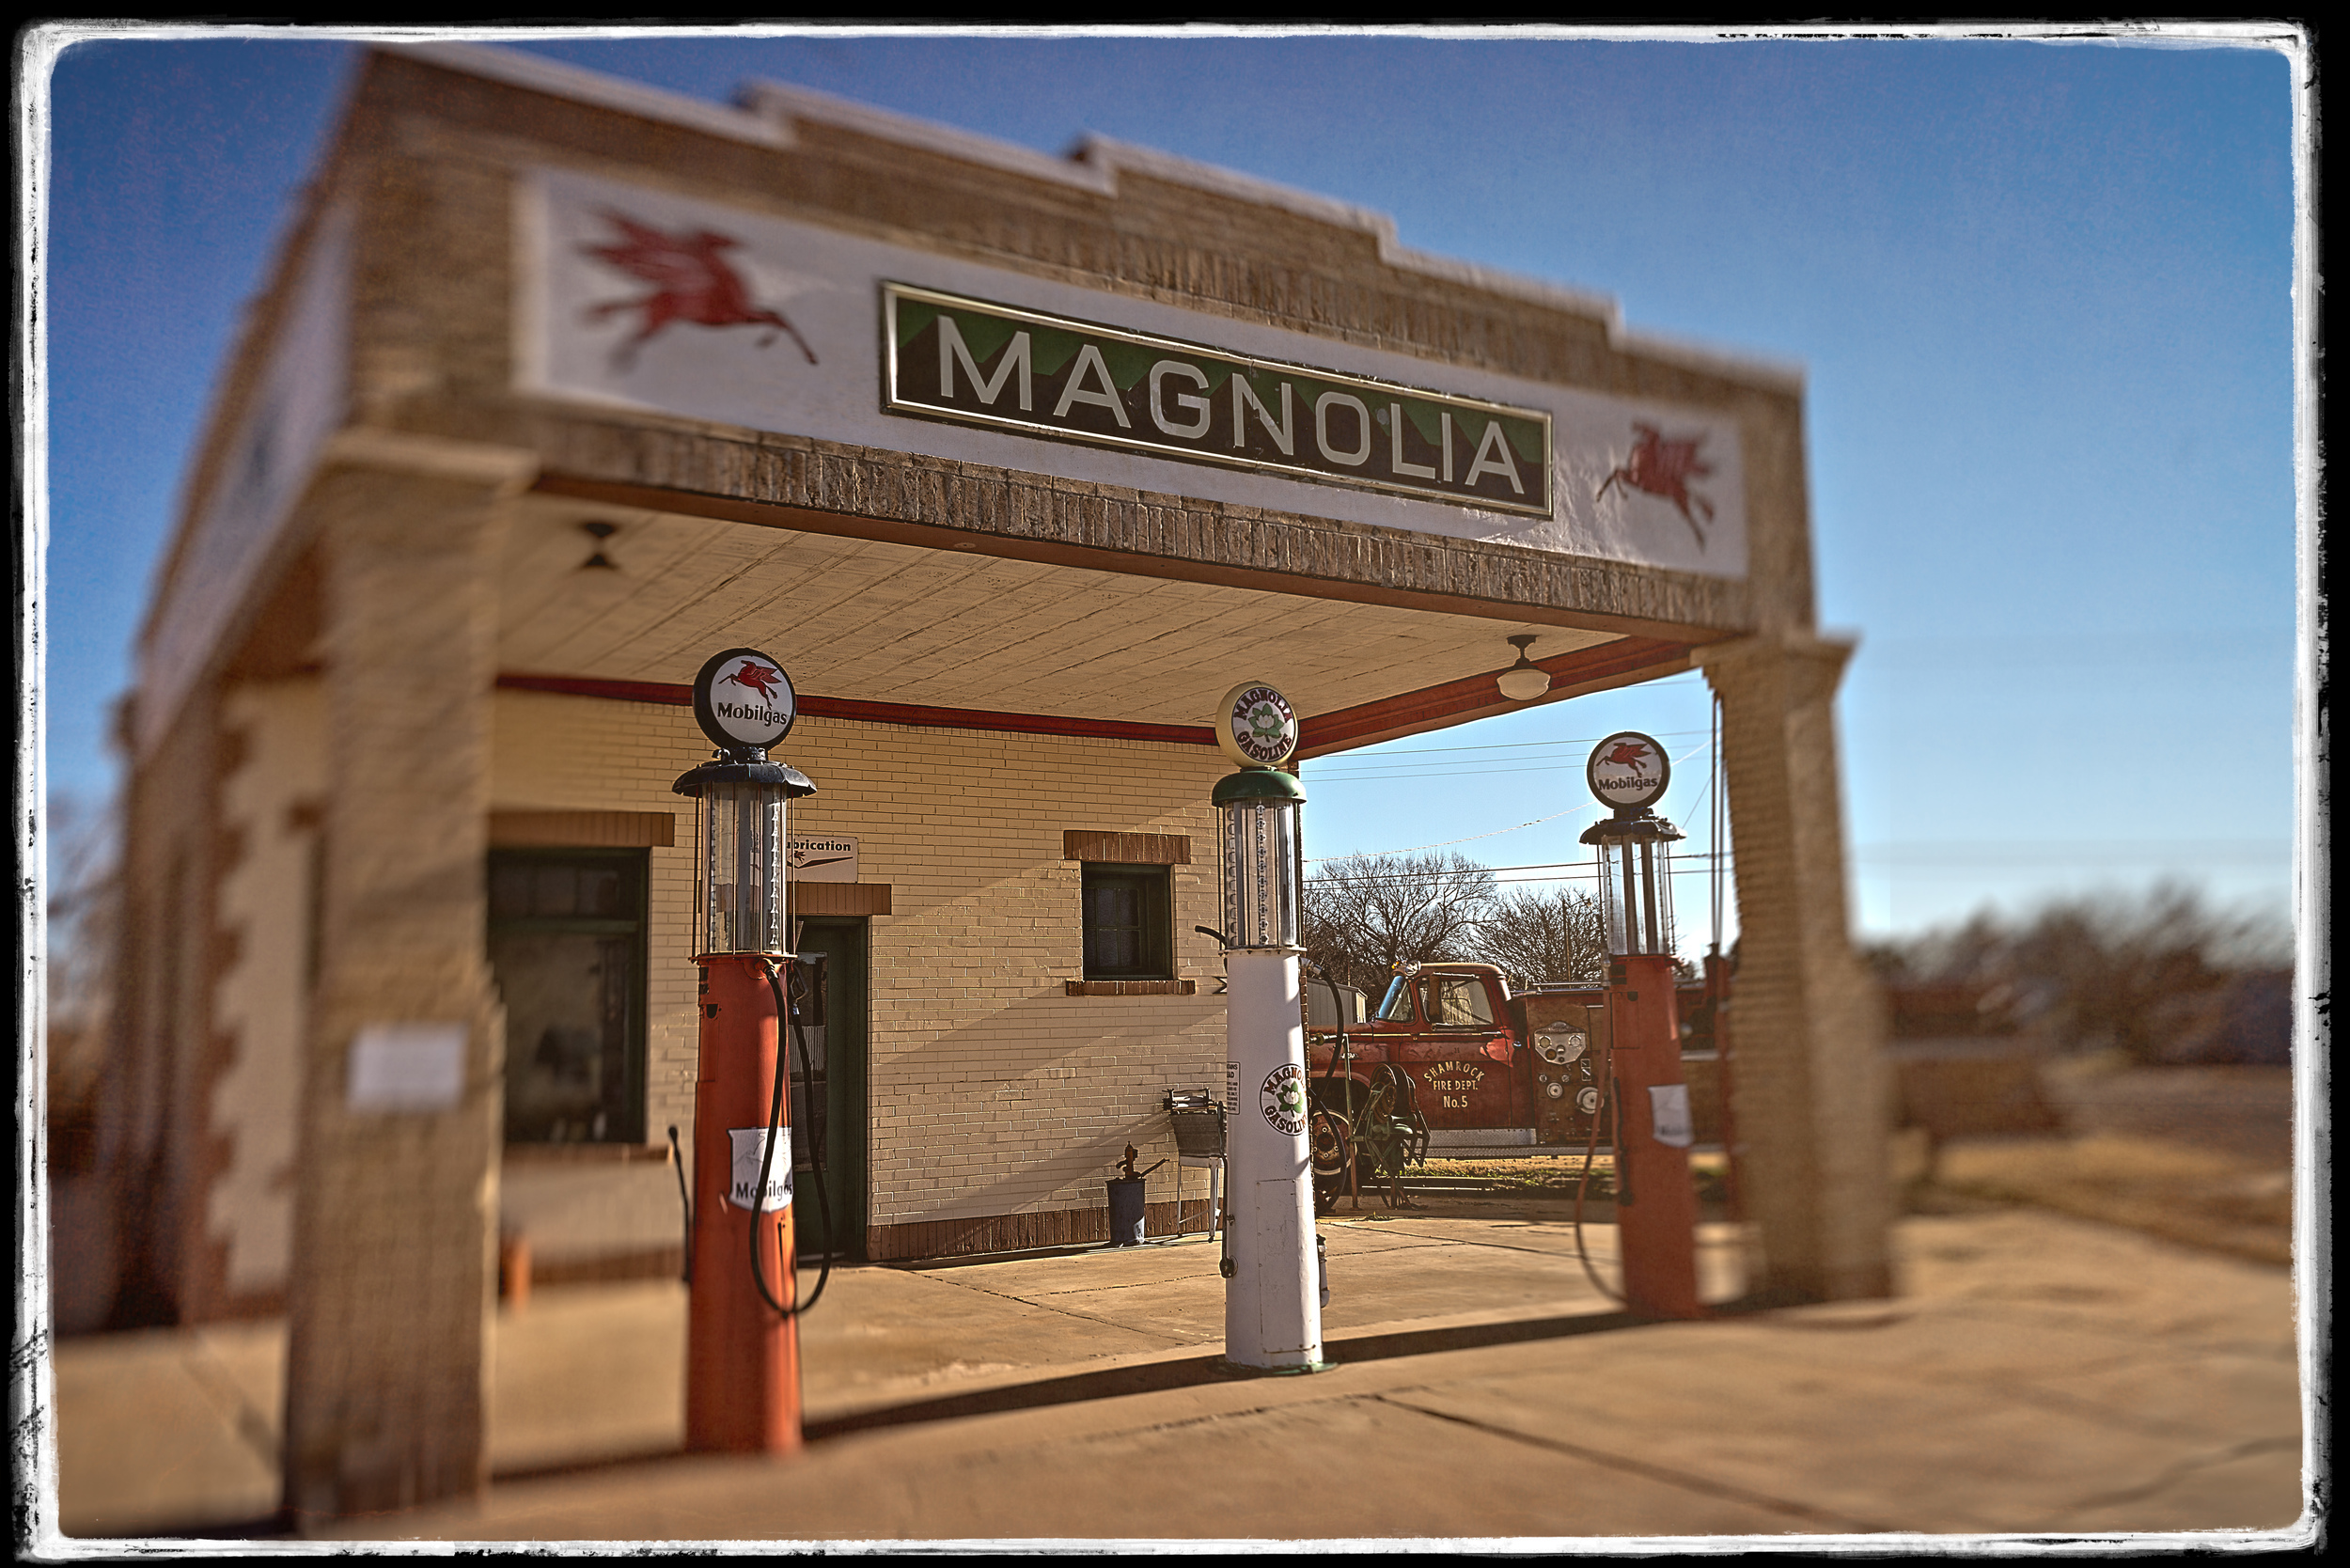 Magnolia Mobil Oil